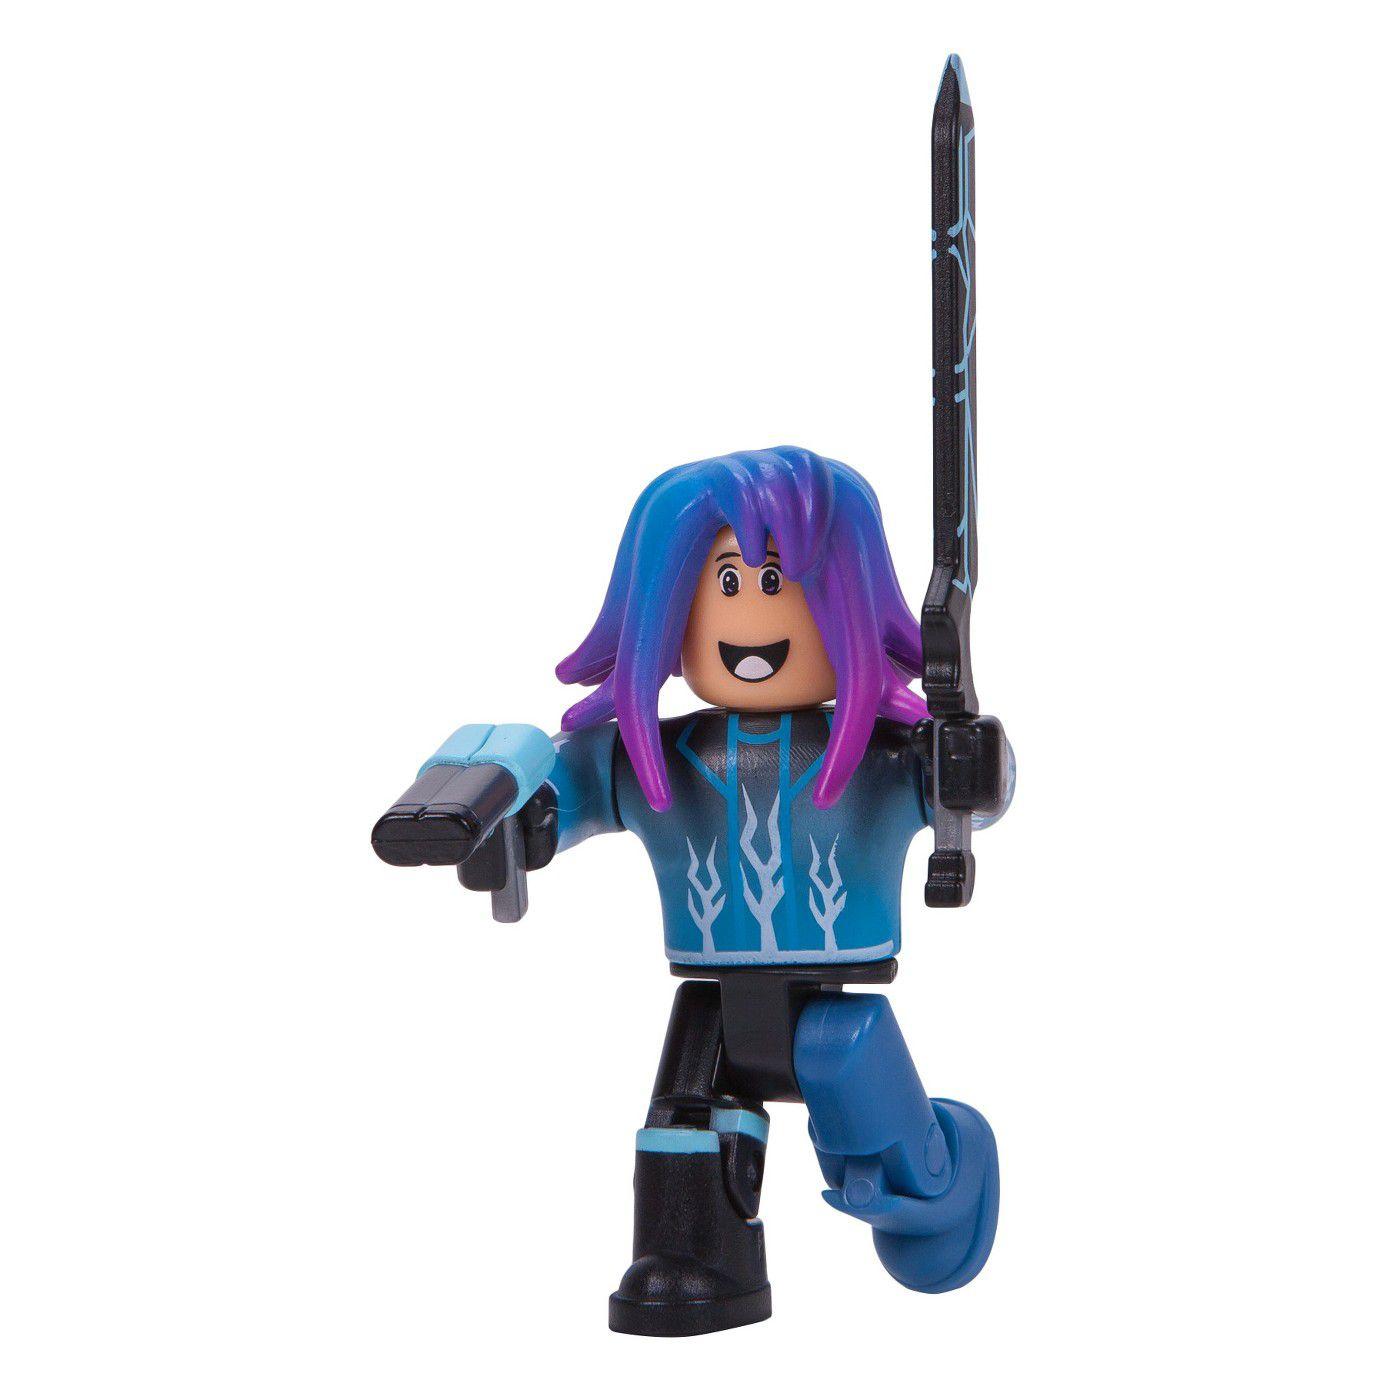 Boneco Roblox - Blue Lazer Parkour Runner